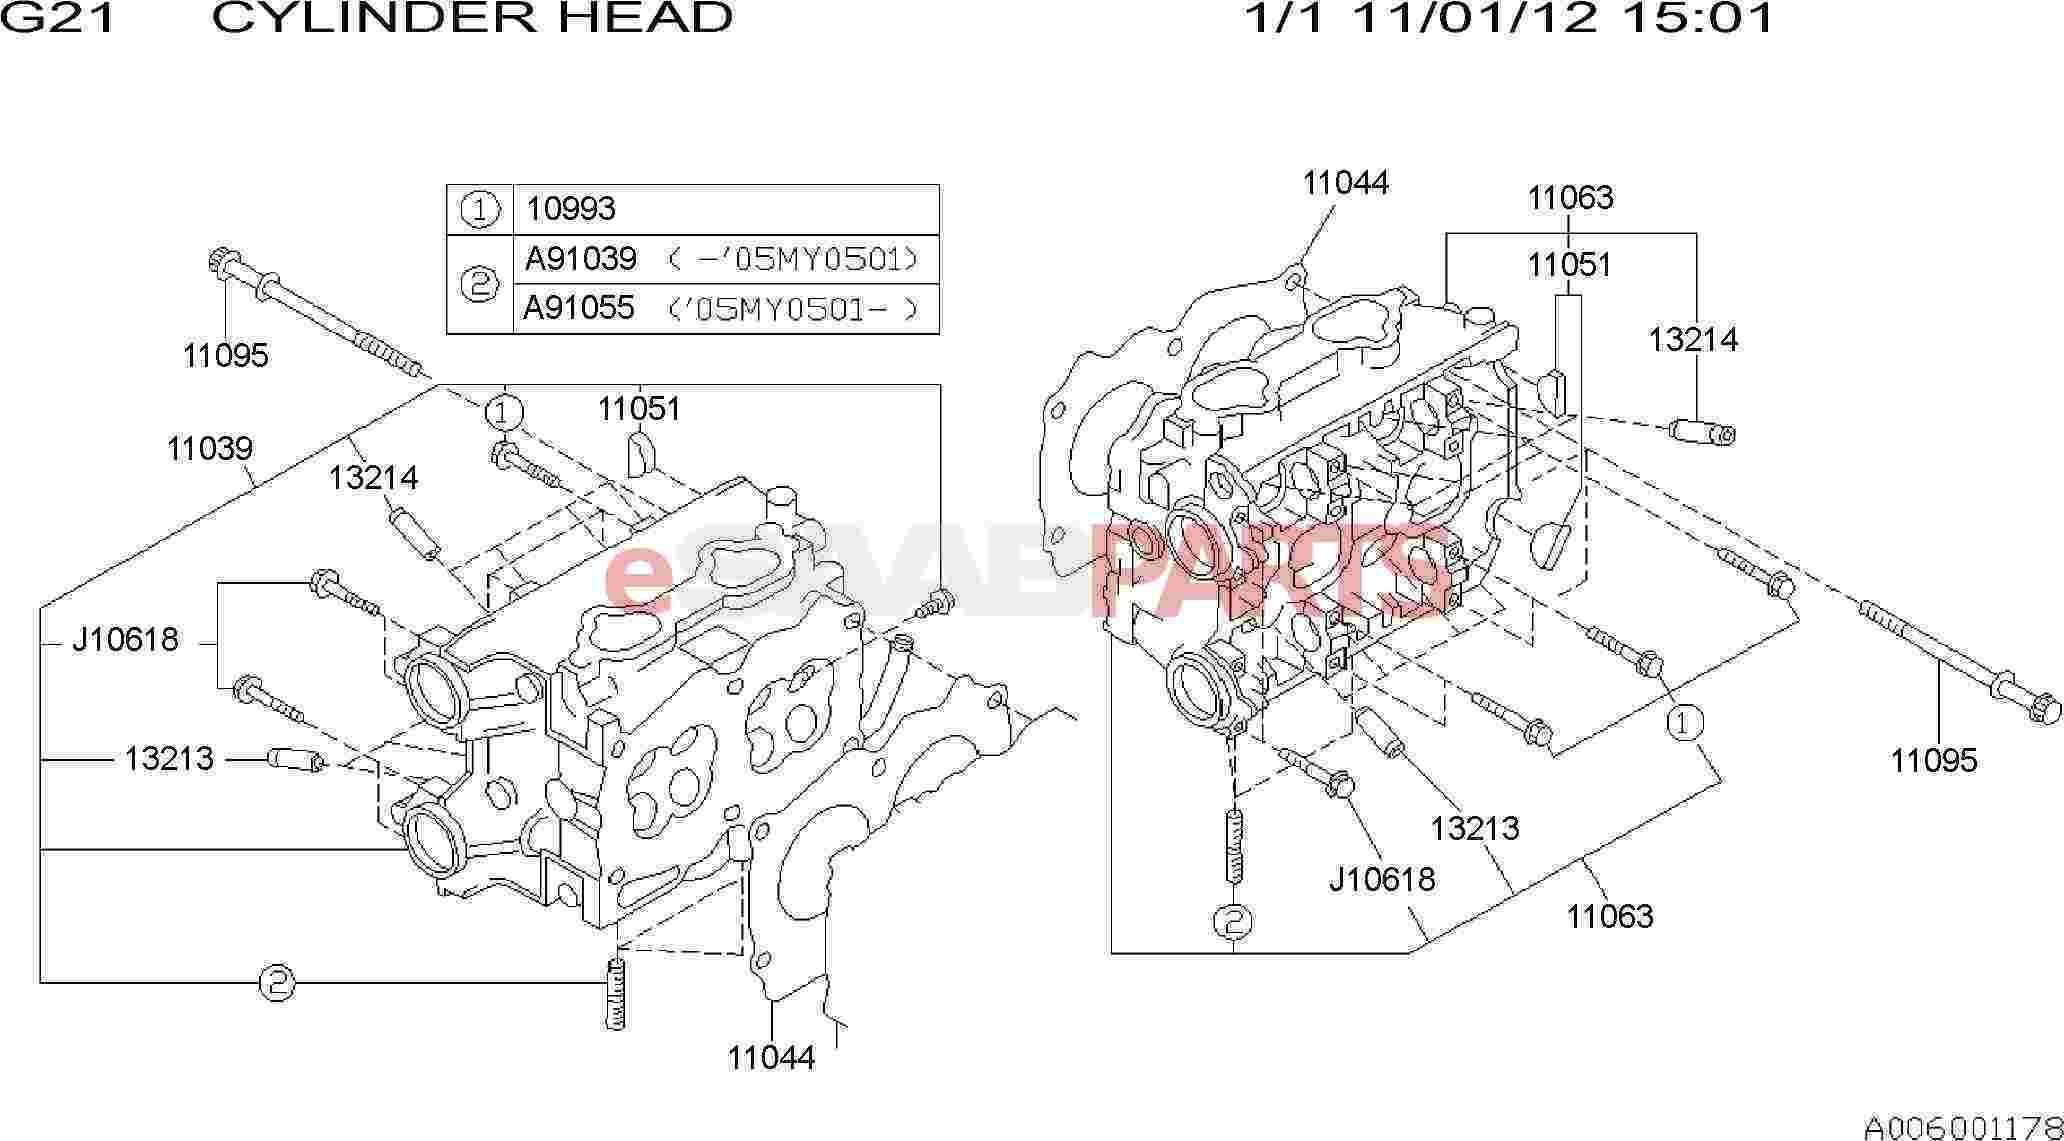 Saab Bolt Assembly Cylinder Head